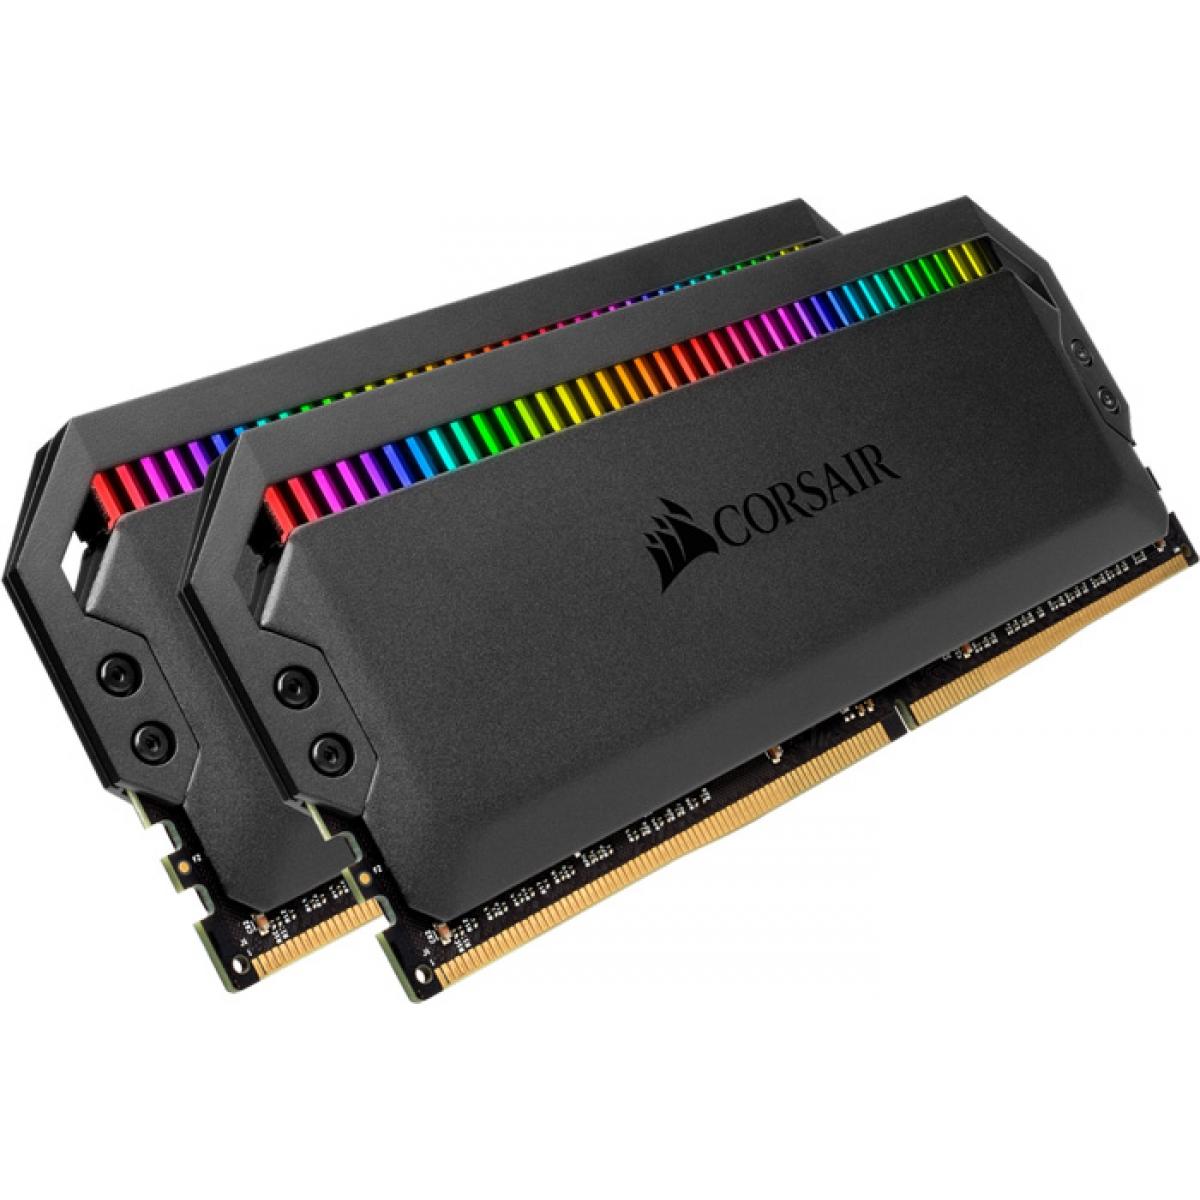 Memória DDR4 Corsair Dominator, RGB, 32GB (2x16GB), 3000MHz, CMT32GX4M2C3000C15